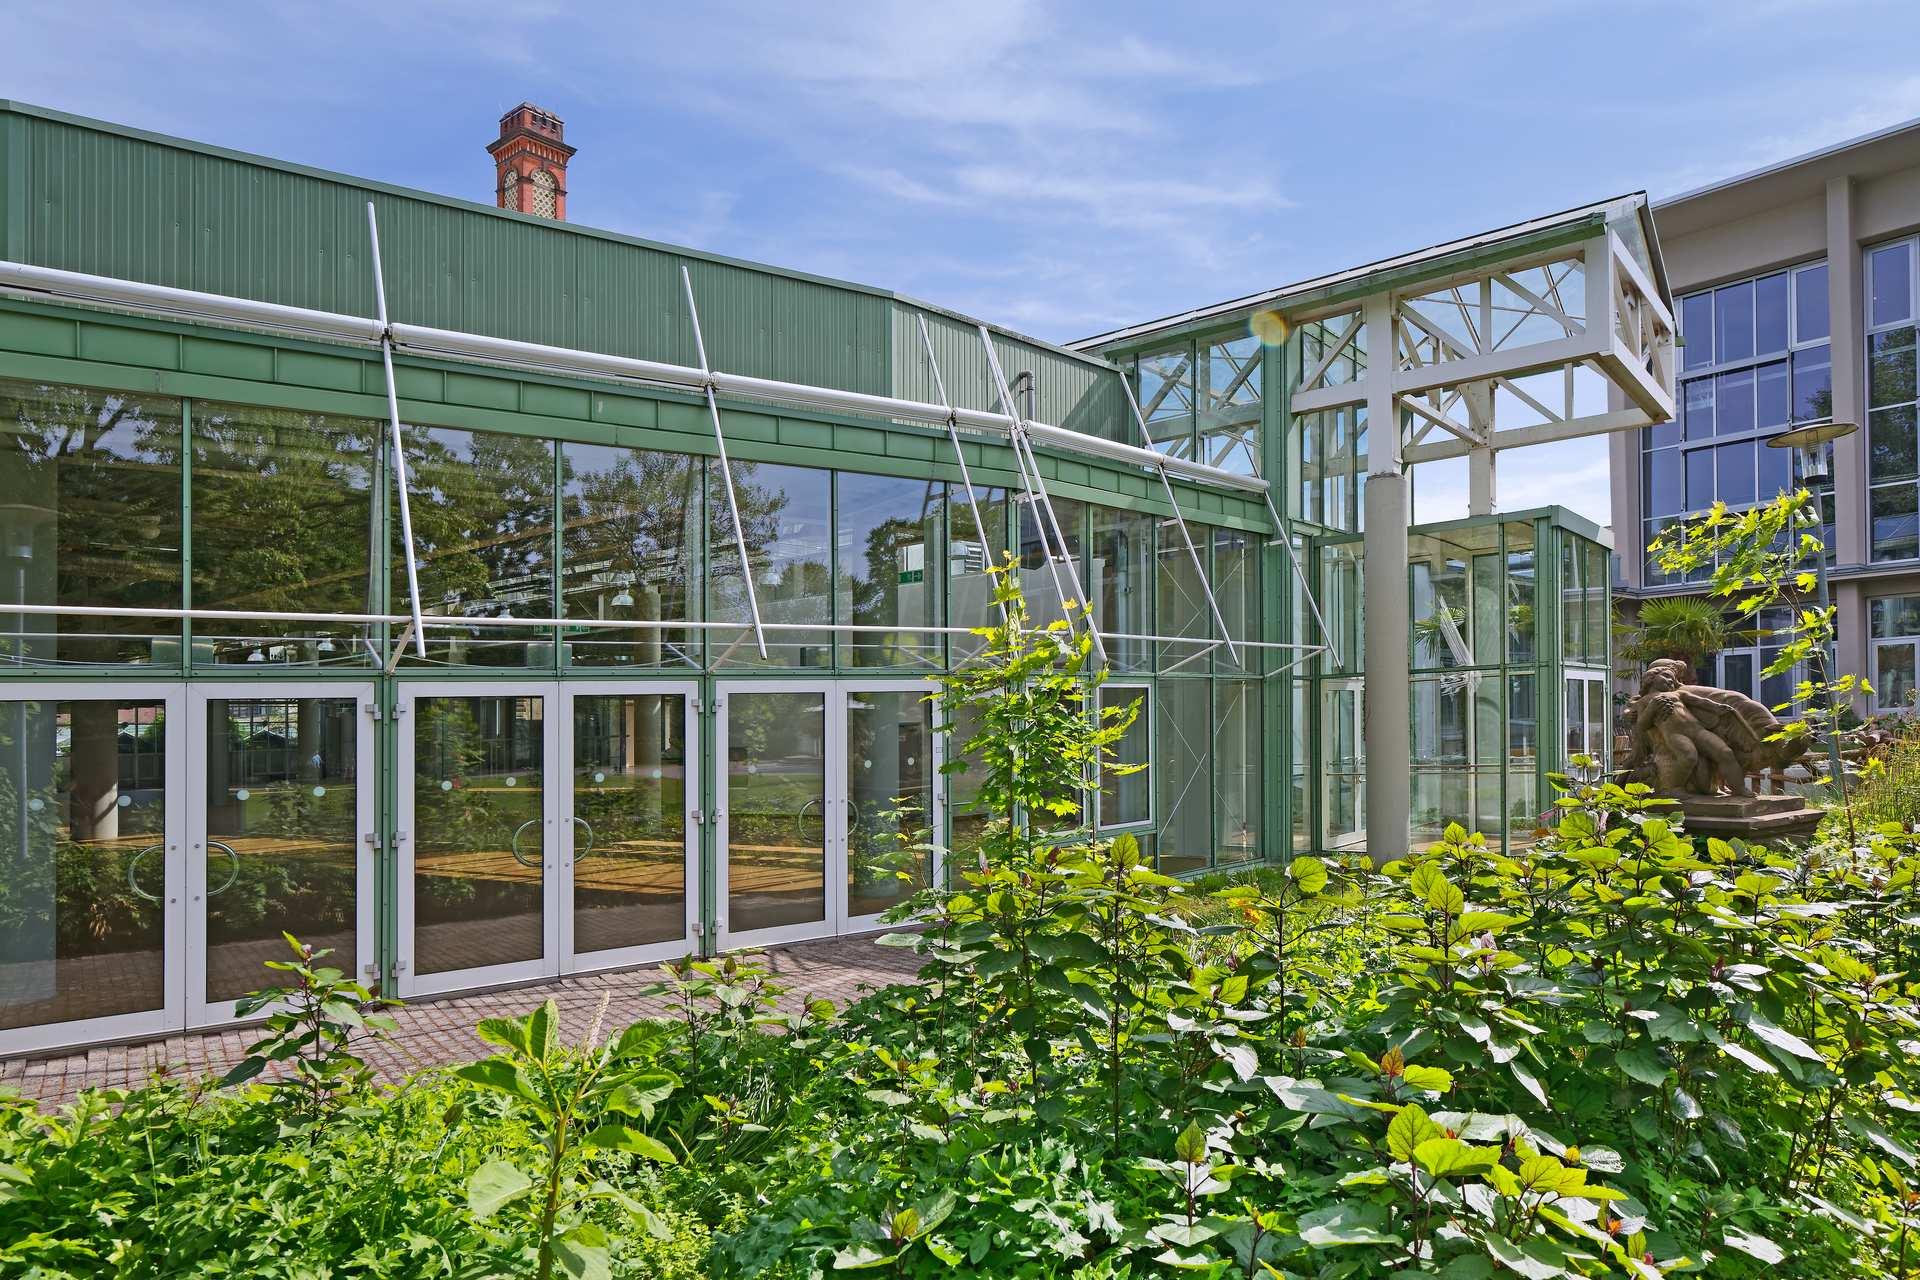 Gartenhalle des Kongresszentrums Karlsruhe